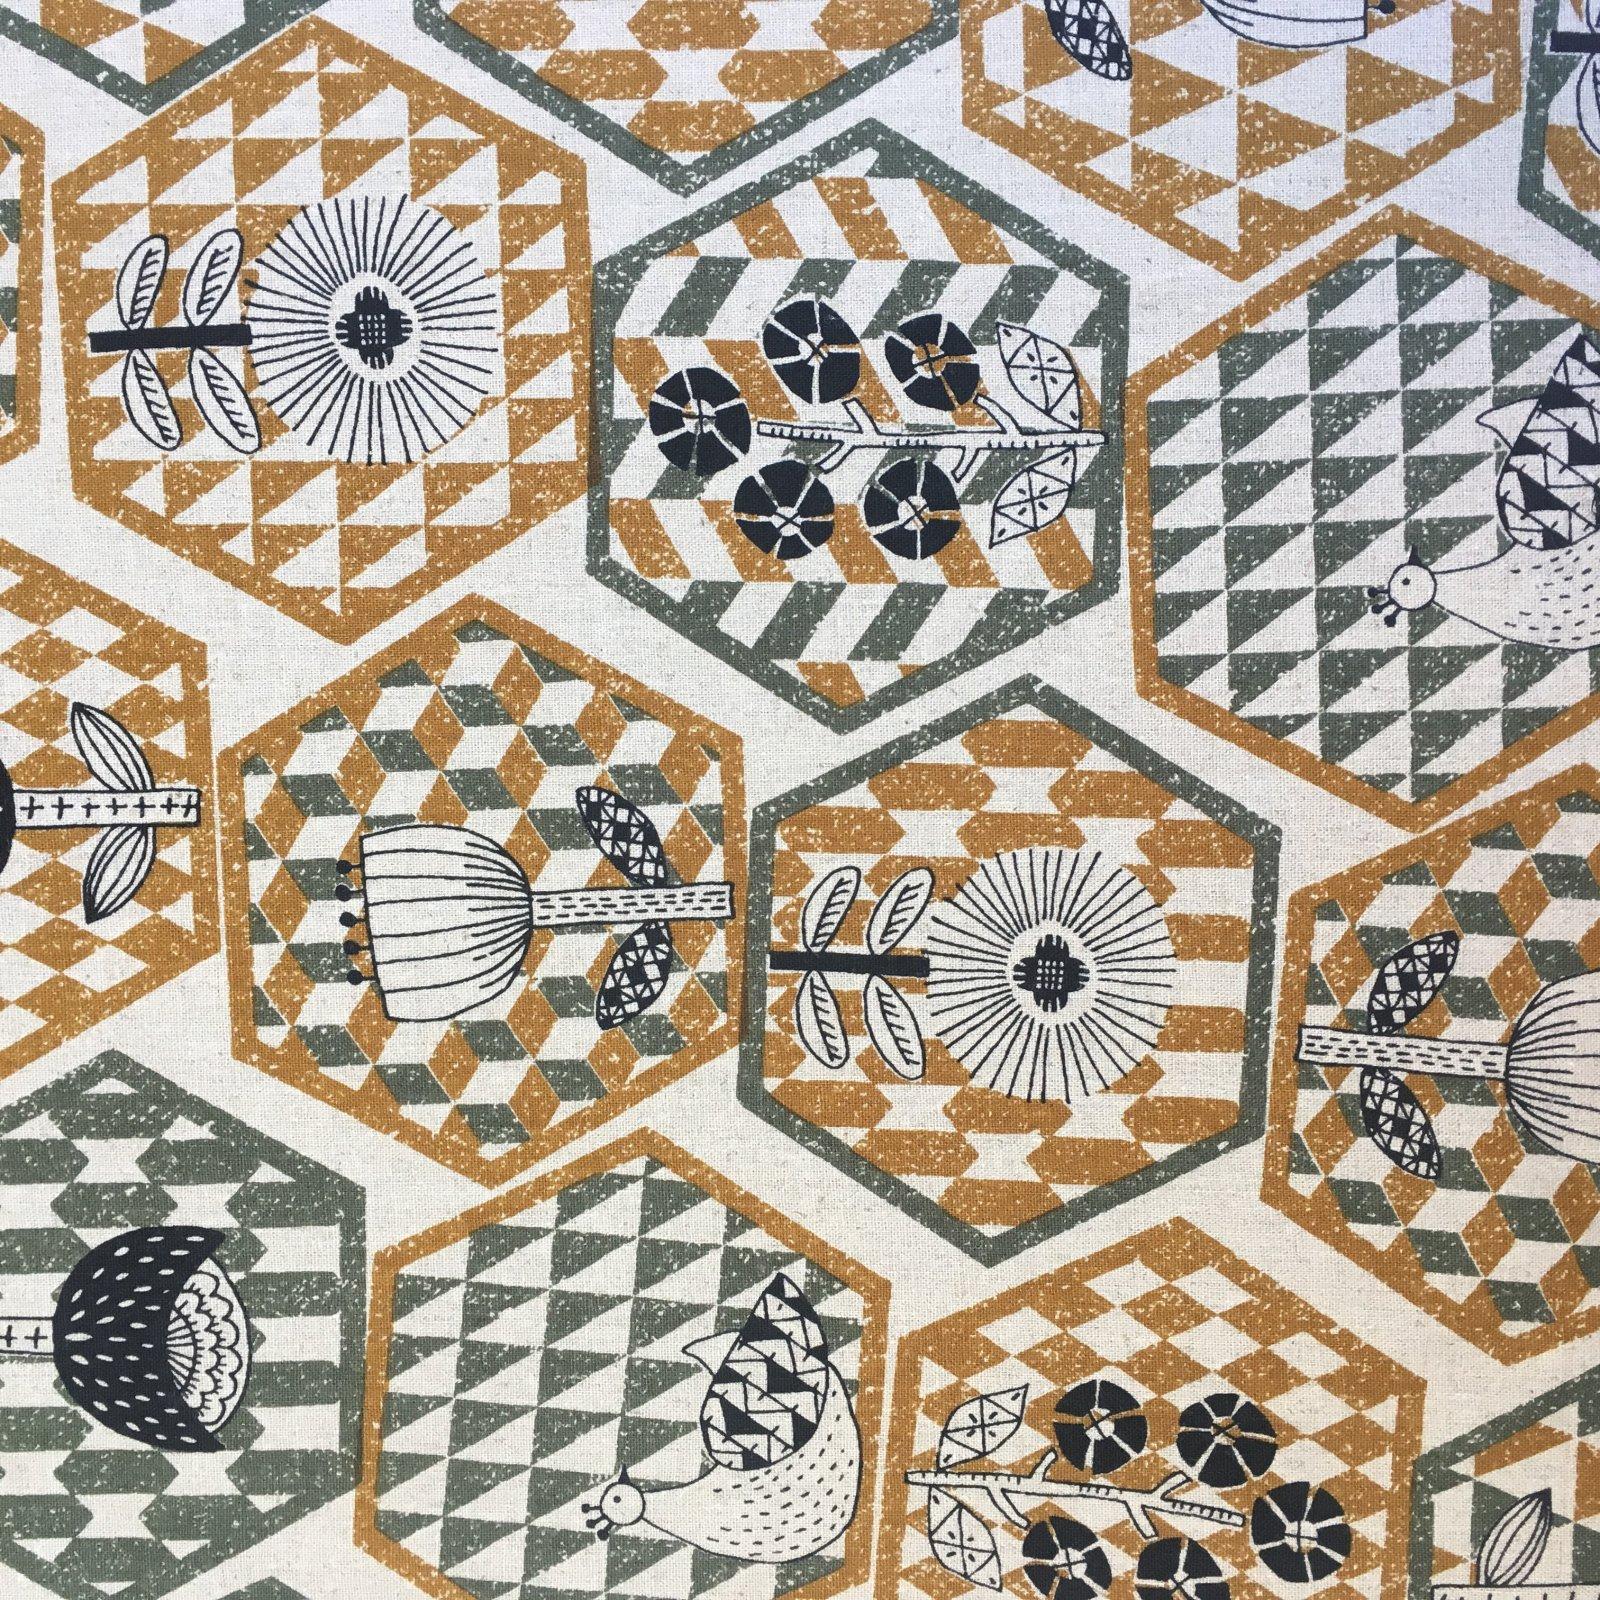 Hummingbird - Cotton/Linen Canvas - Hexagons